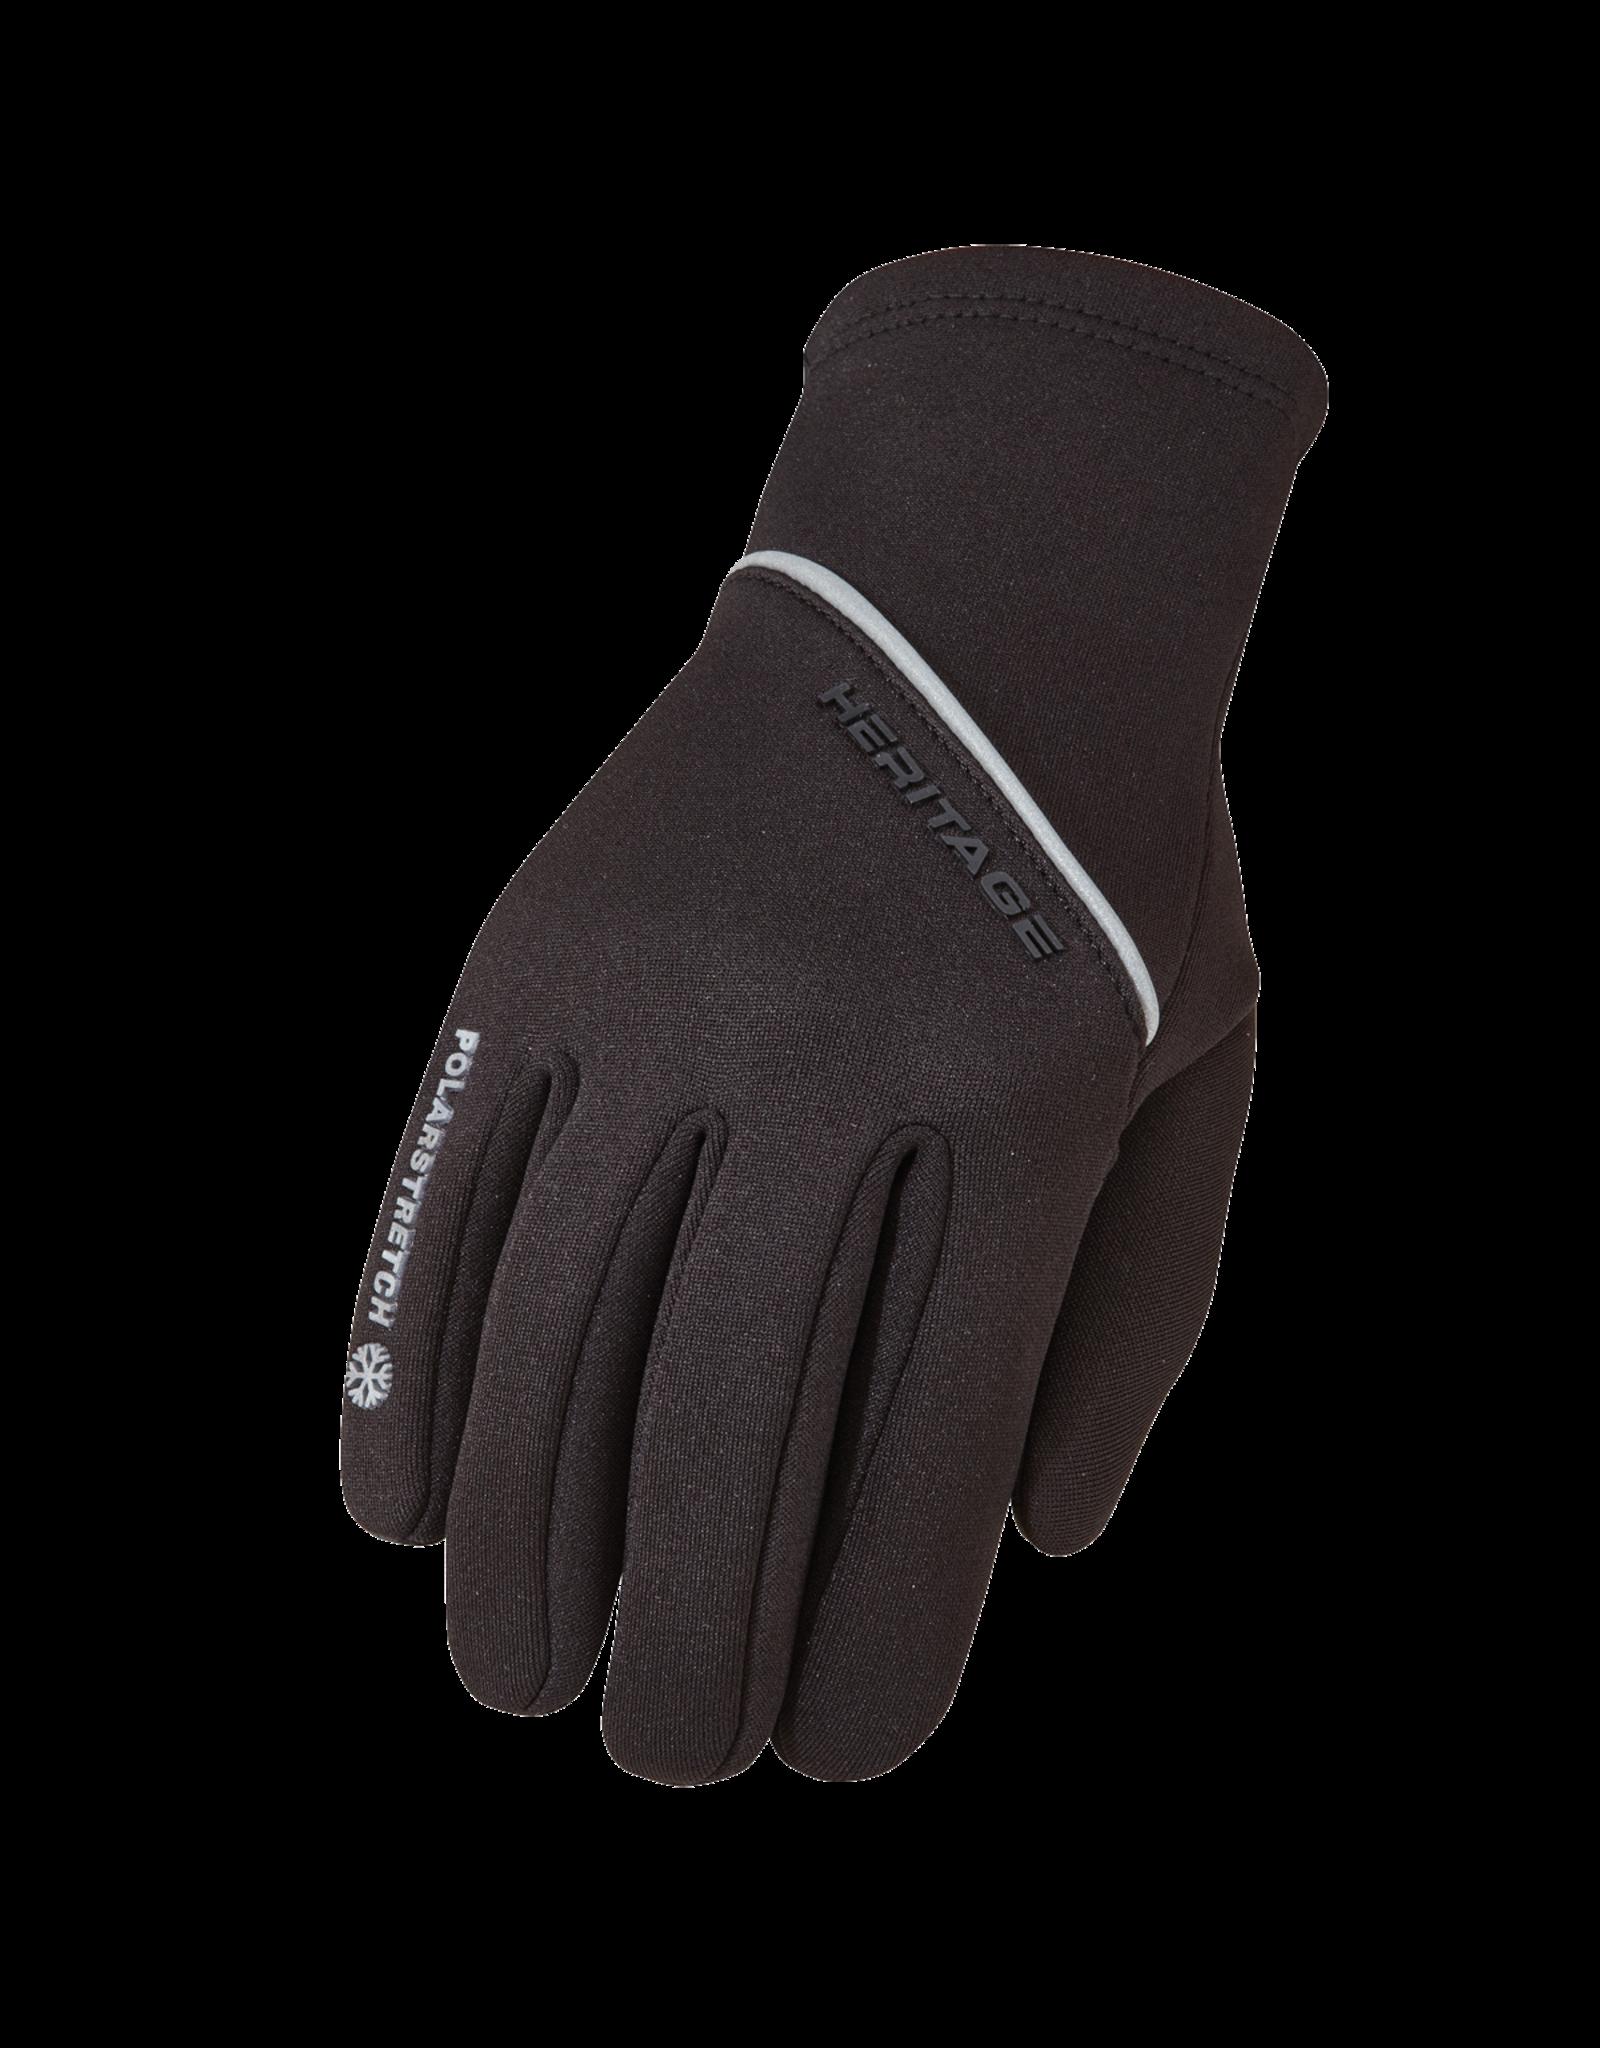 Heritage Polarstretch 2.0 Winter Glove